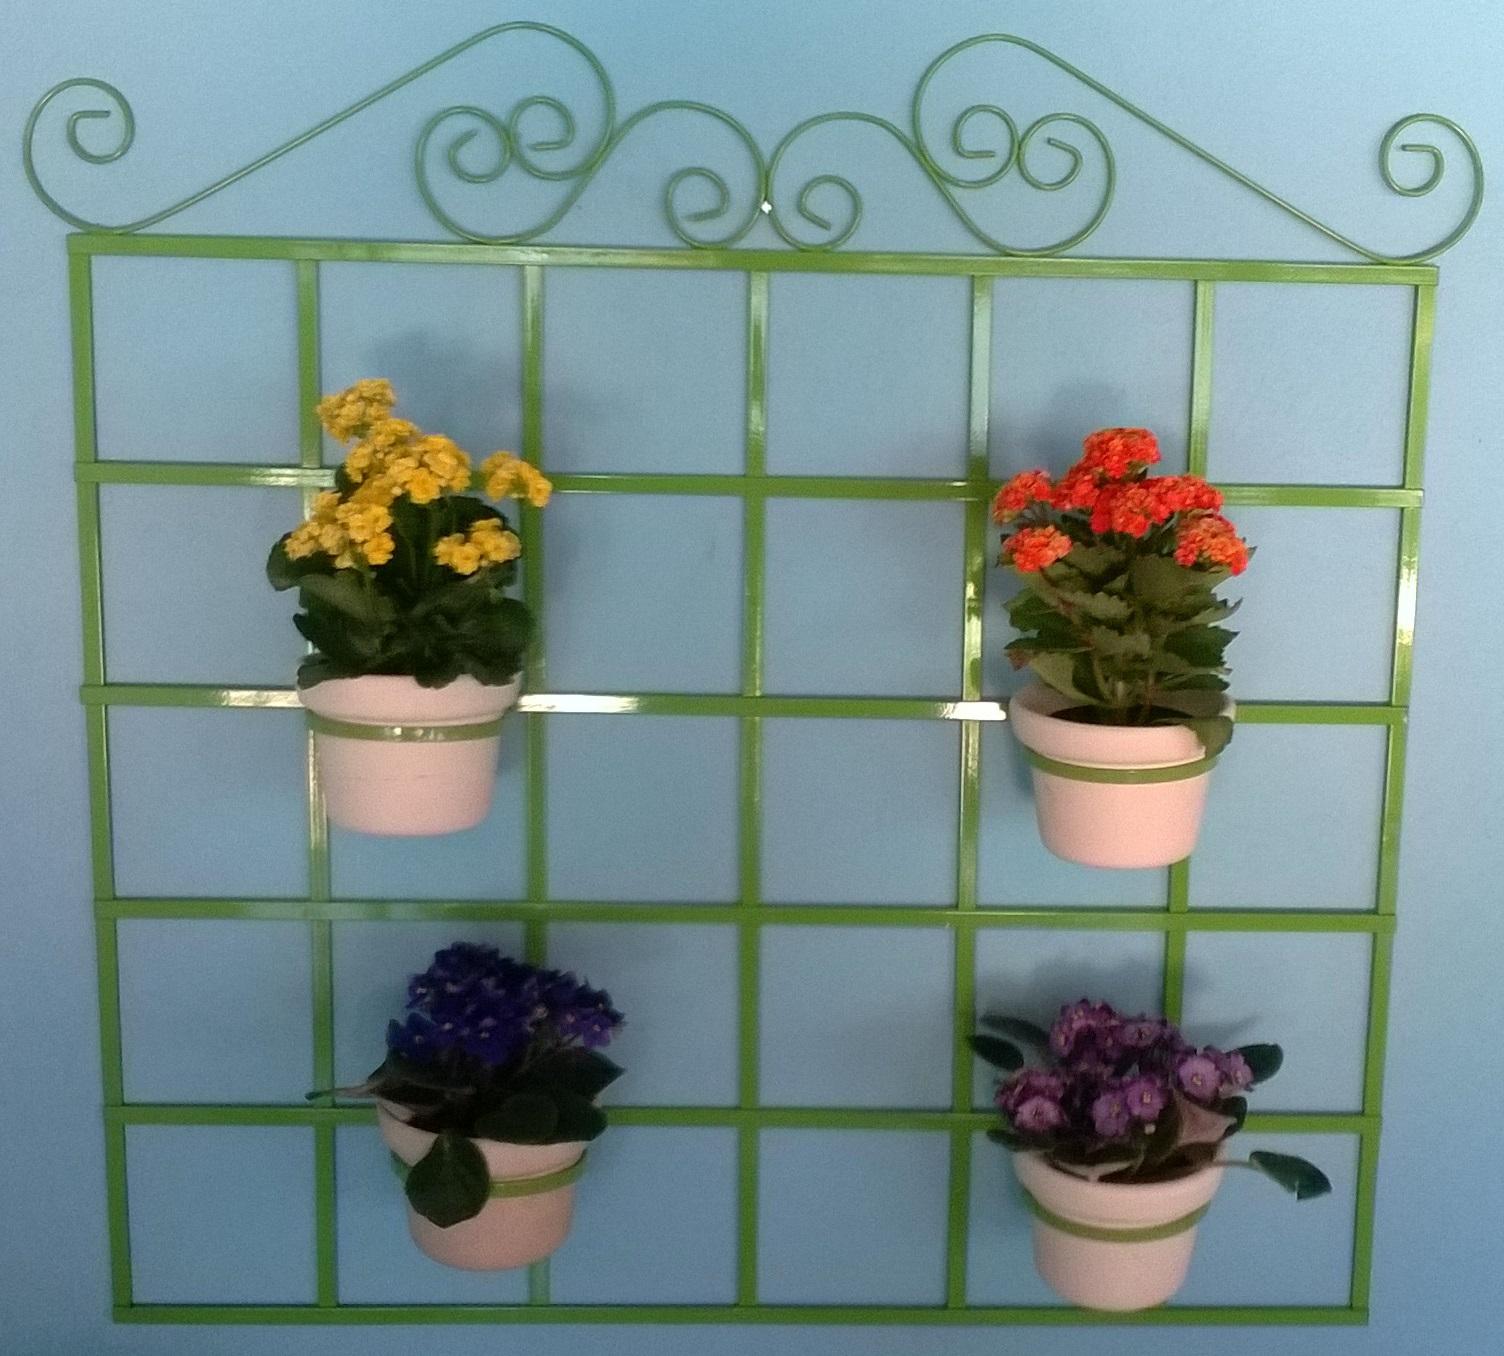 trelica jardim vertical:trelica-para-jardim-vertical-trelica-para-jardim-vertical-suporte-para